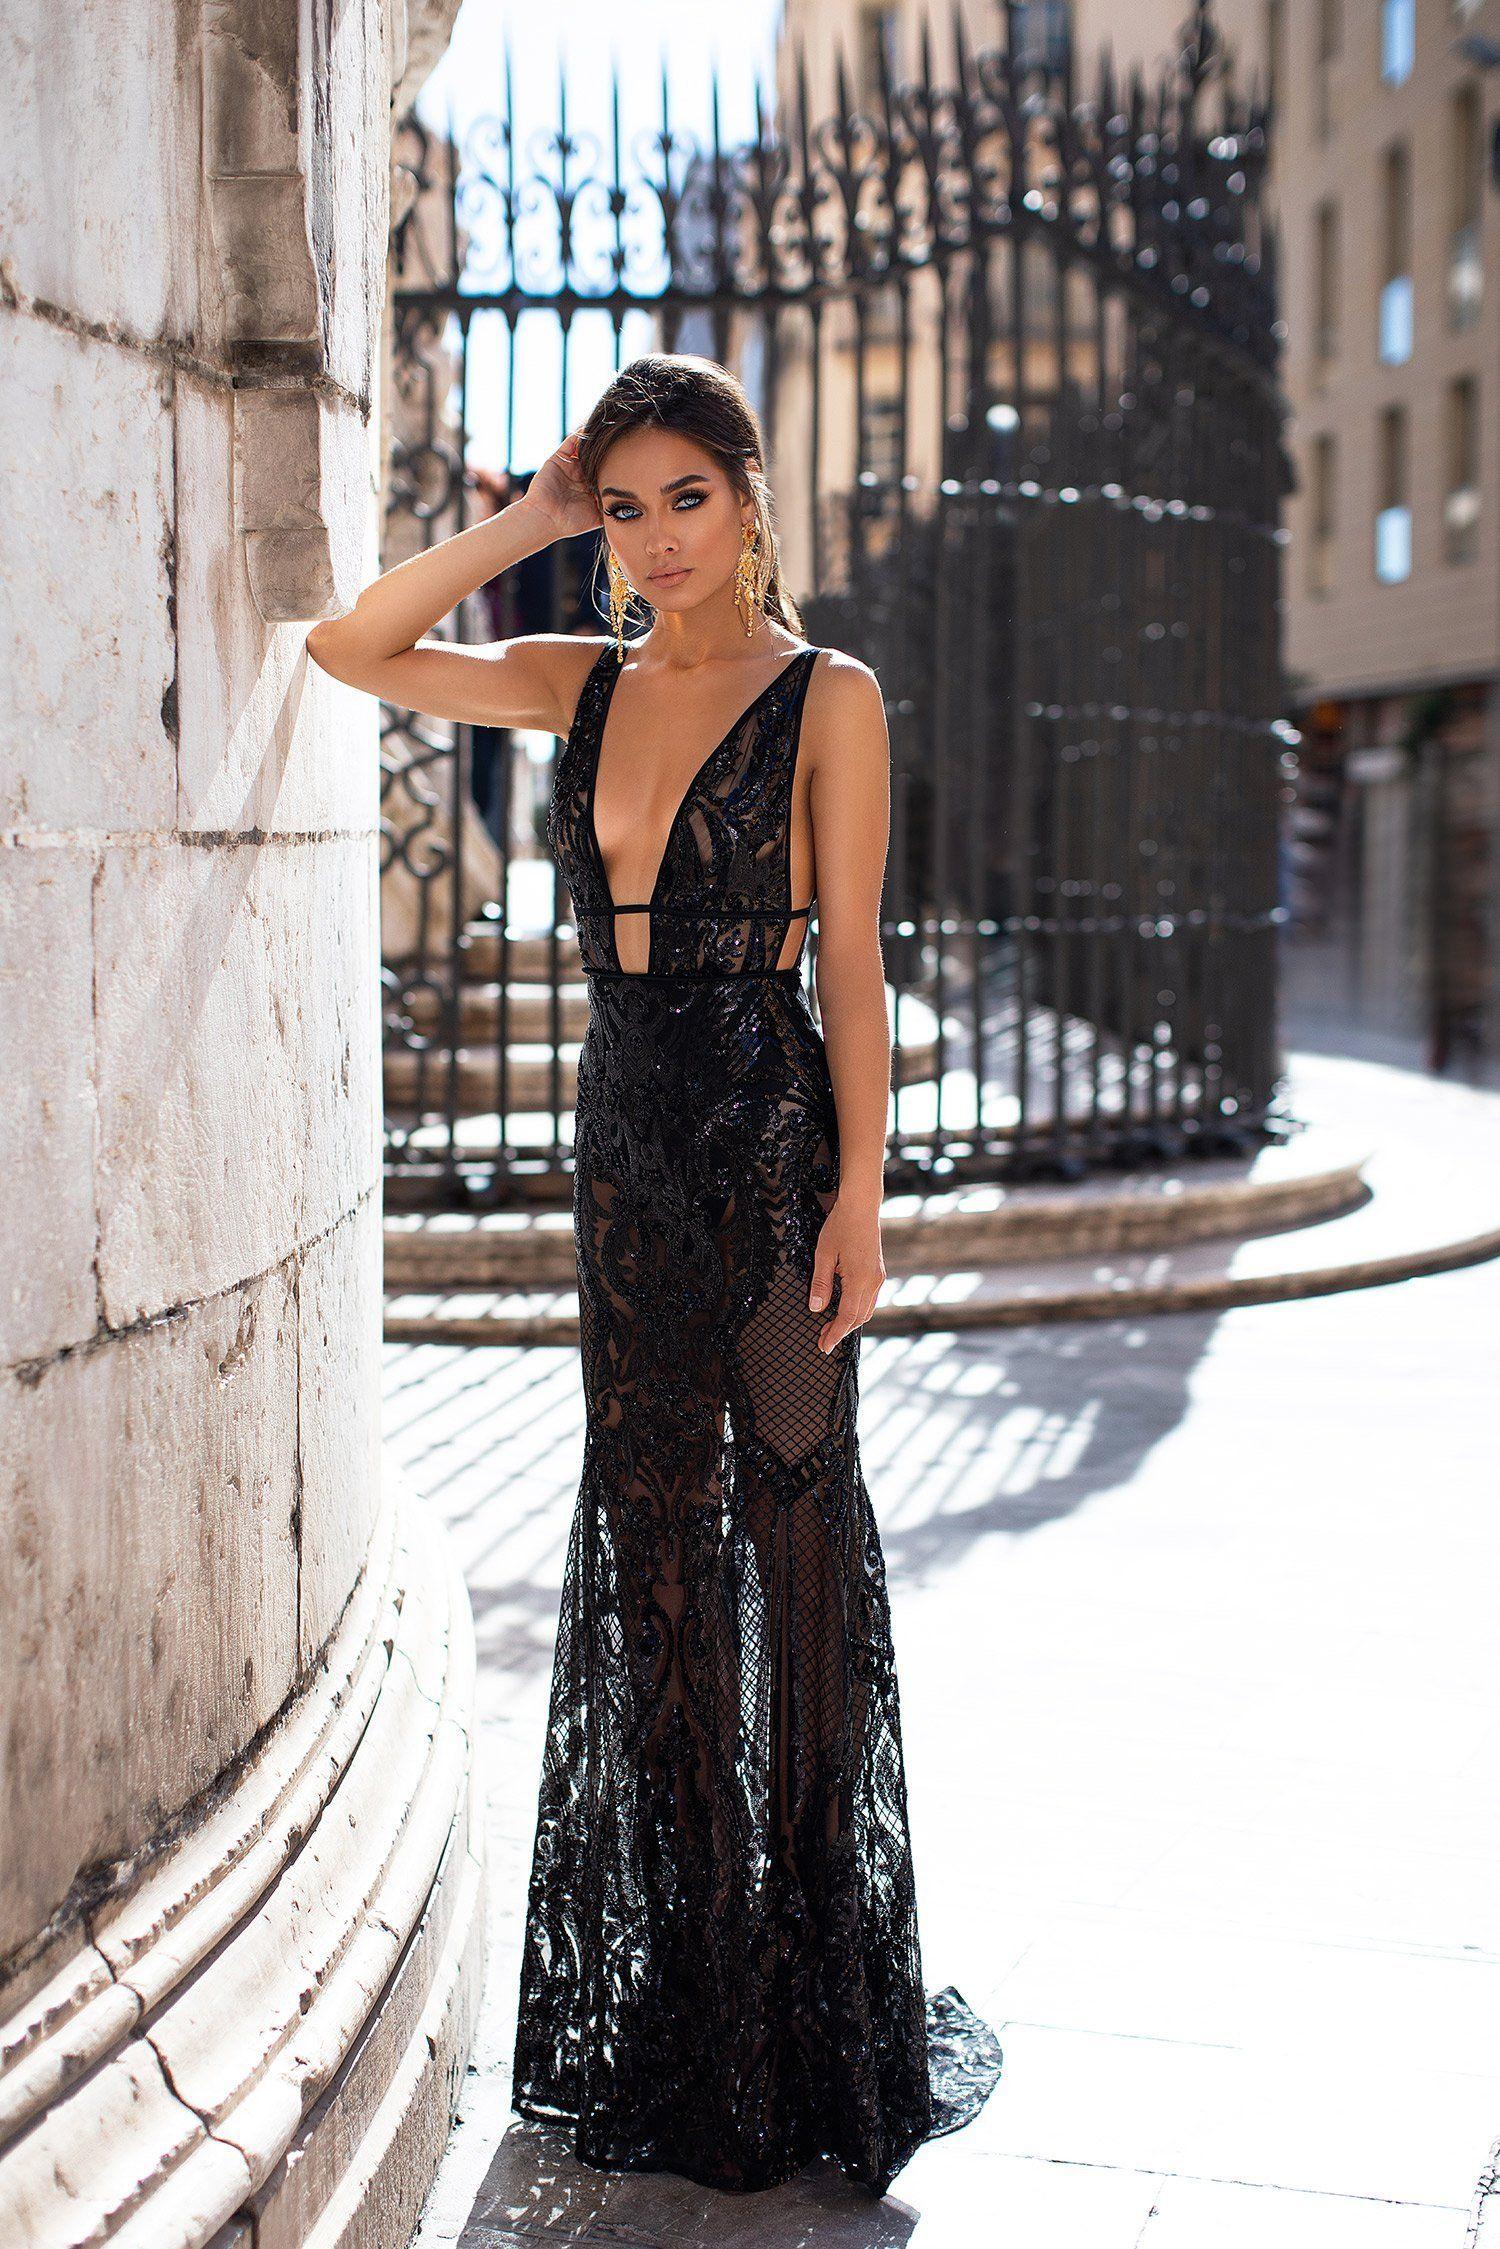 Elyse Black Black Sequin Dress Fashion Dresses [ 2249 x 1500 Pixel ]